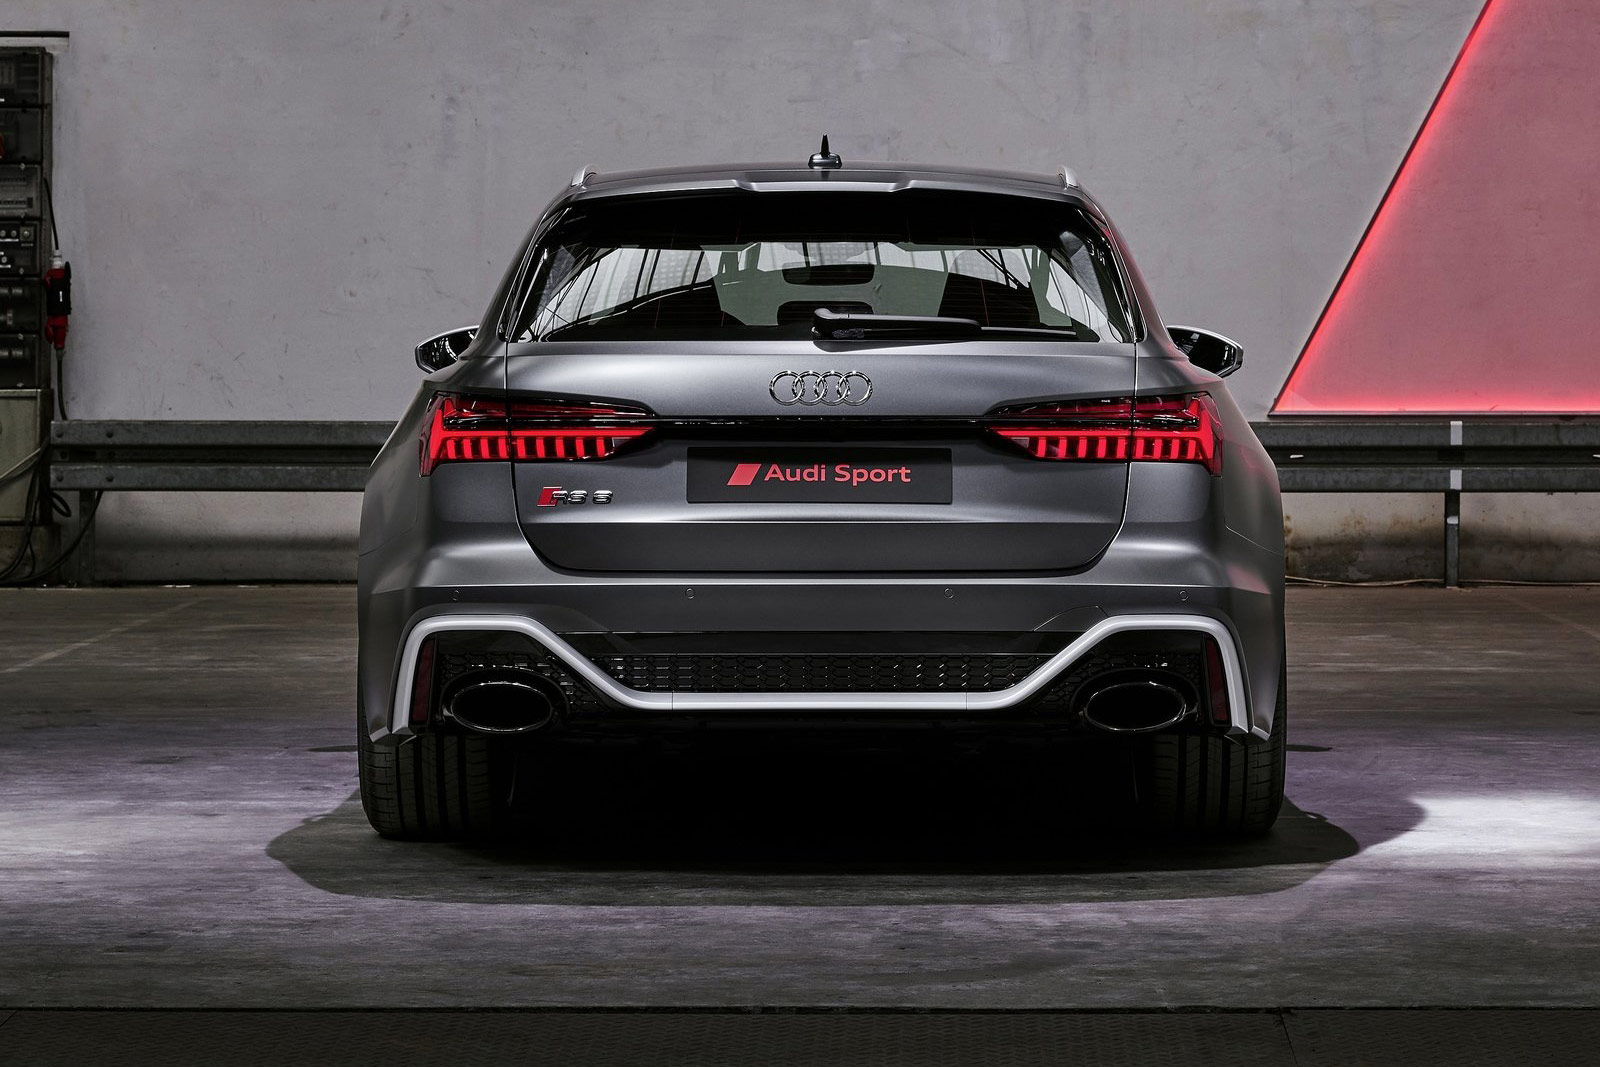 Audi RS6 Avant 2019: 600 PS stark, 305 km/h schnell